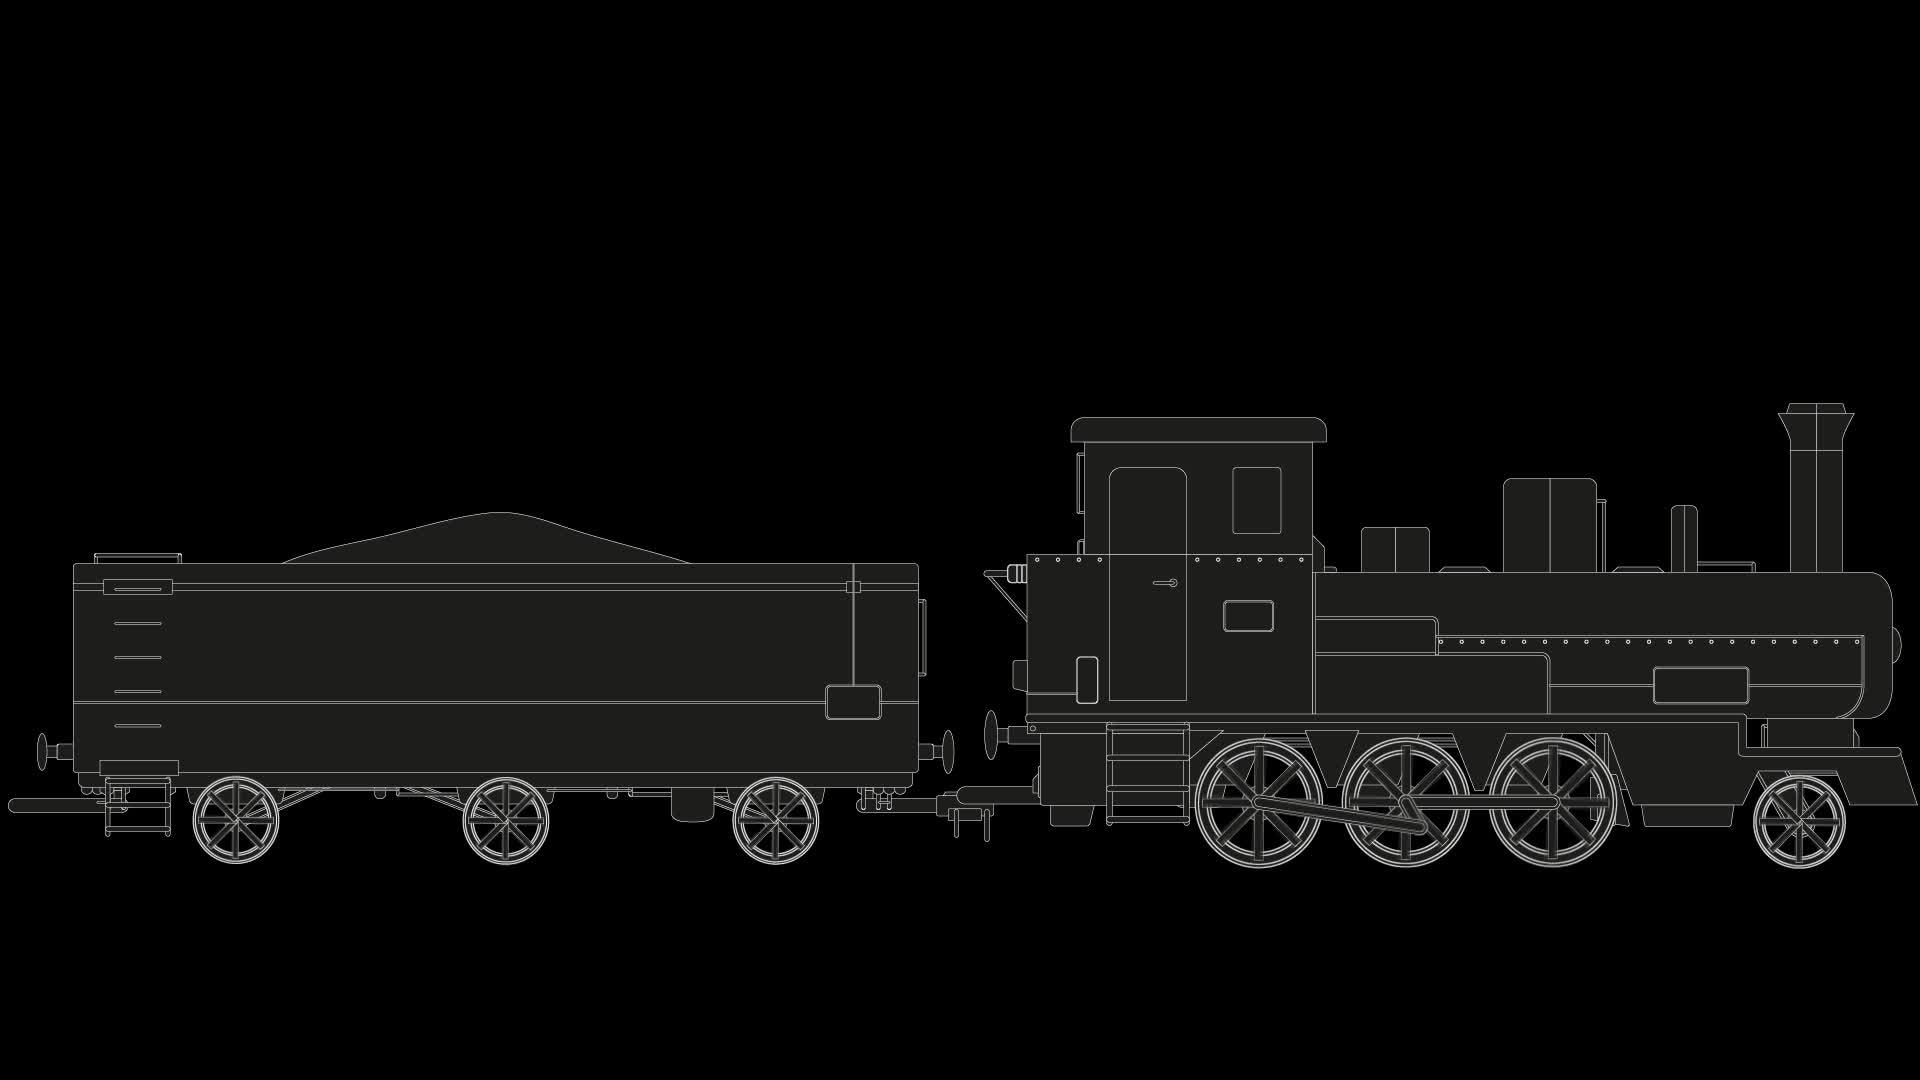 train, trains, transportation, slide_05DARK TRAIN GIFs